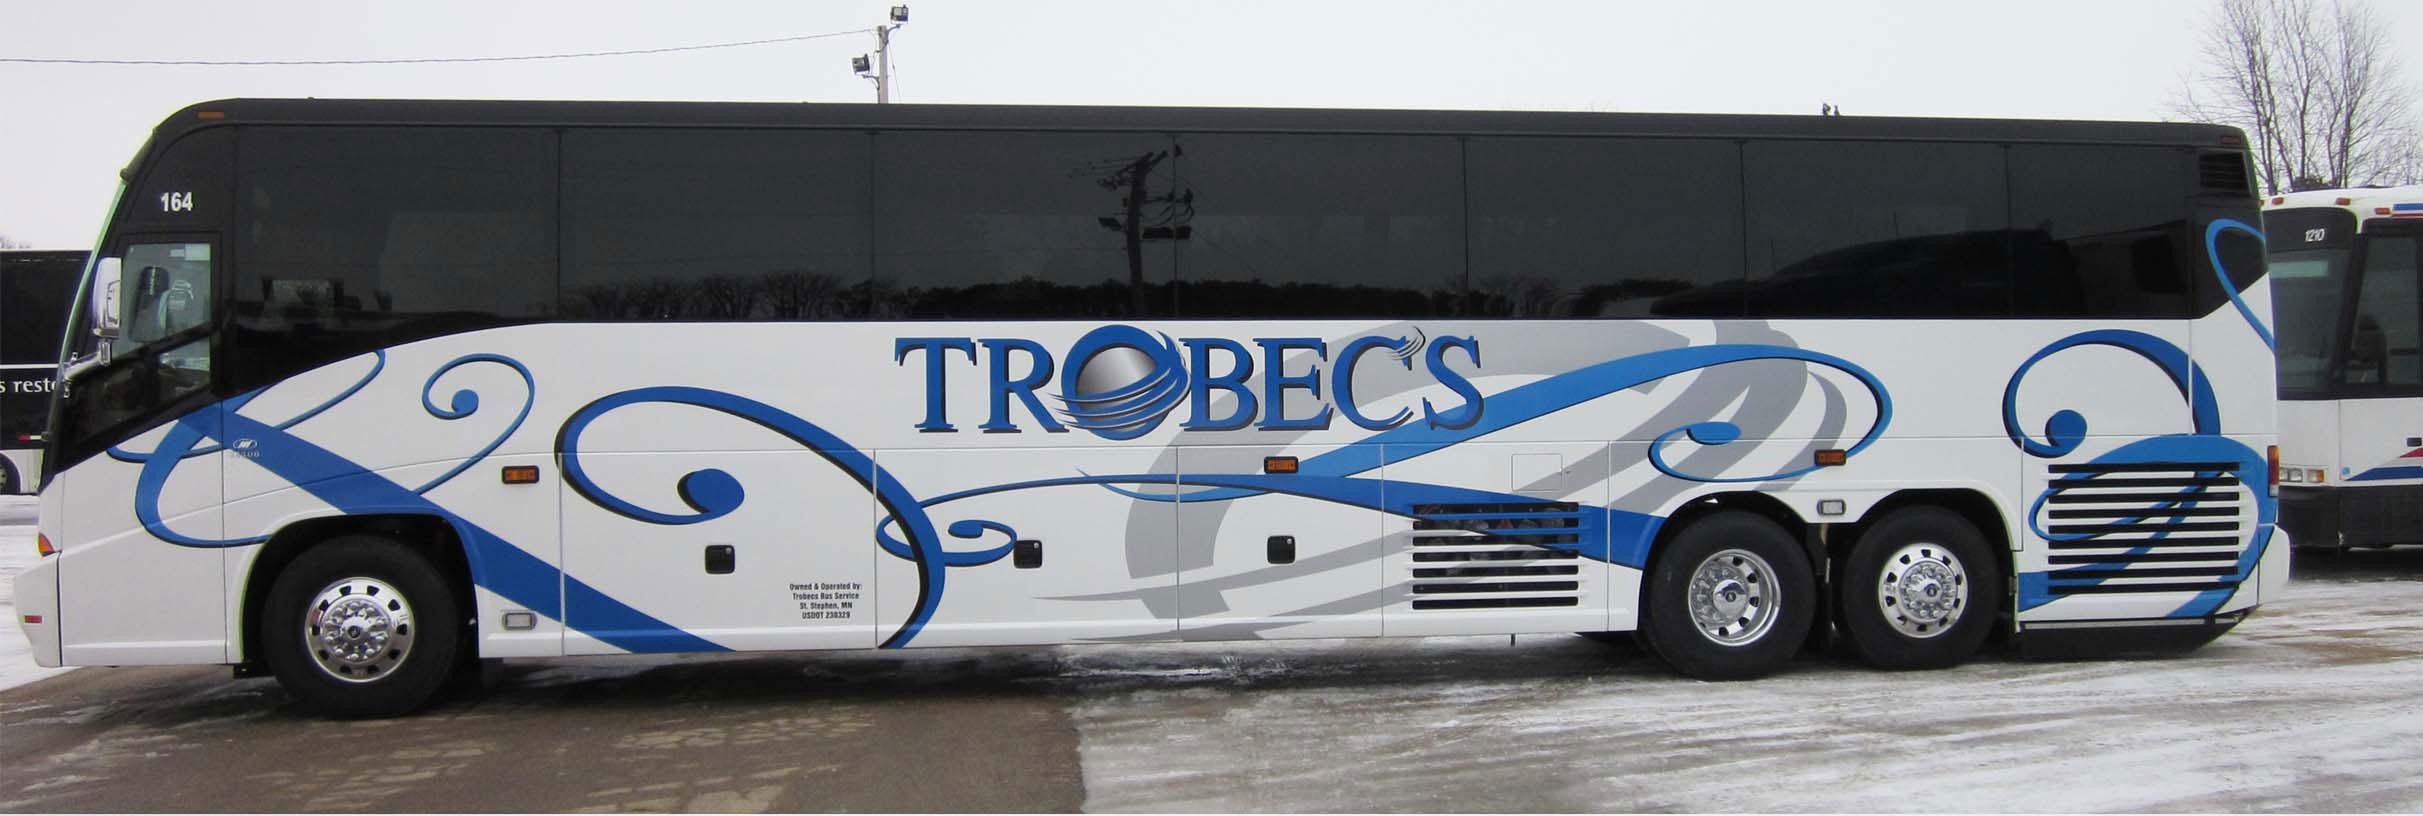 _TROBEC'S-VINYL-GRAPHIC-(10).jpg